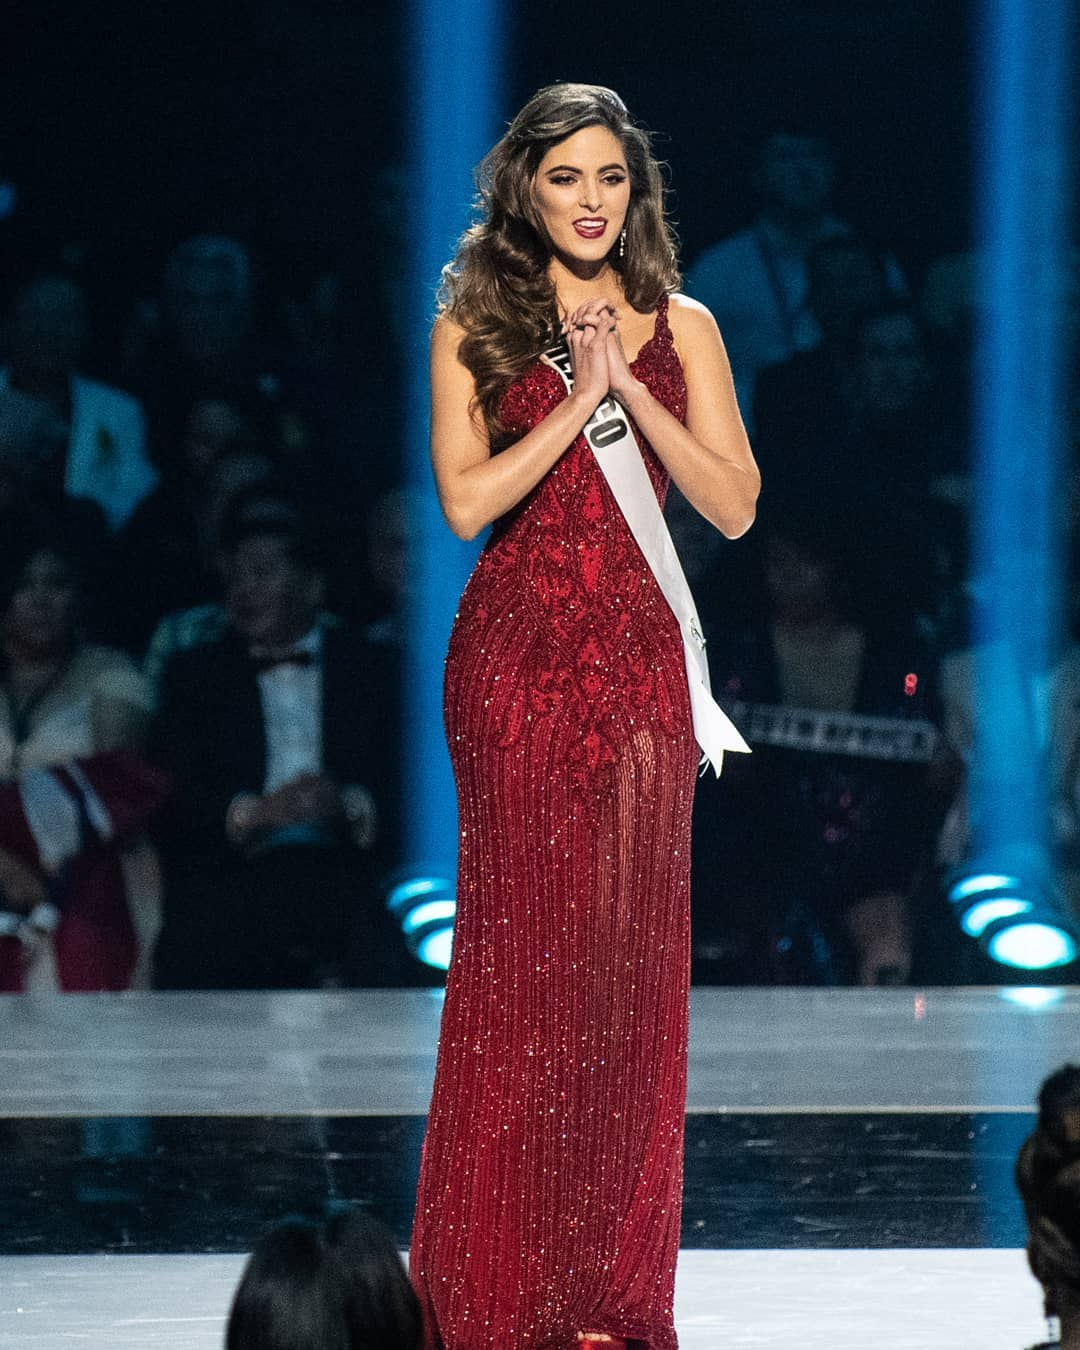 sofia aragon, 2nd runner-up de miss universe 2019. - Página 16 75403110